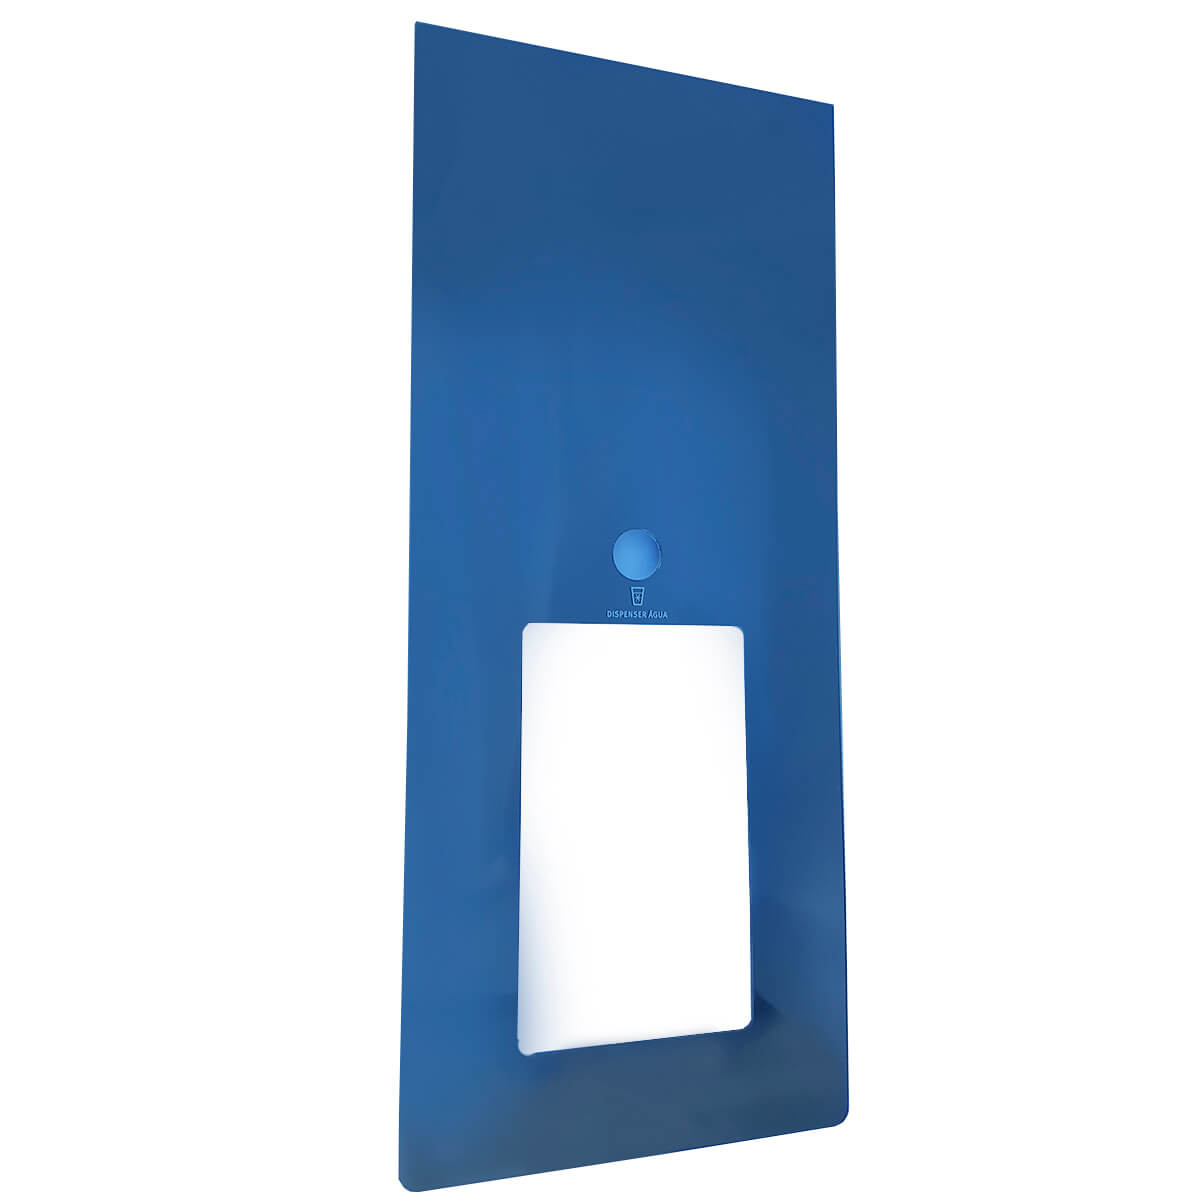 Complemento Da Porta Refrigerador Electrolux DWX51 - 70202159